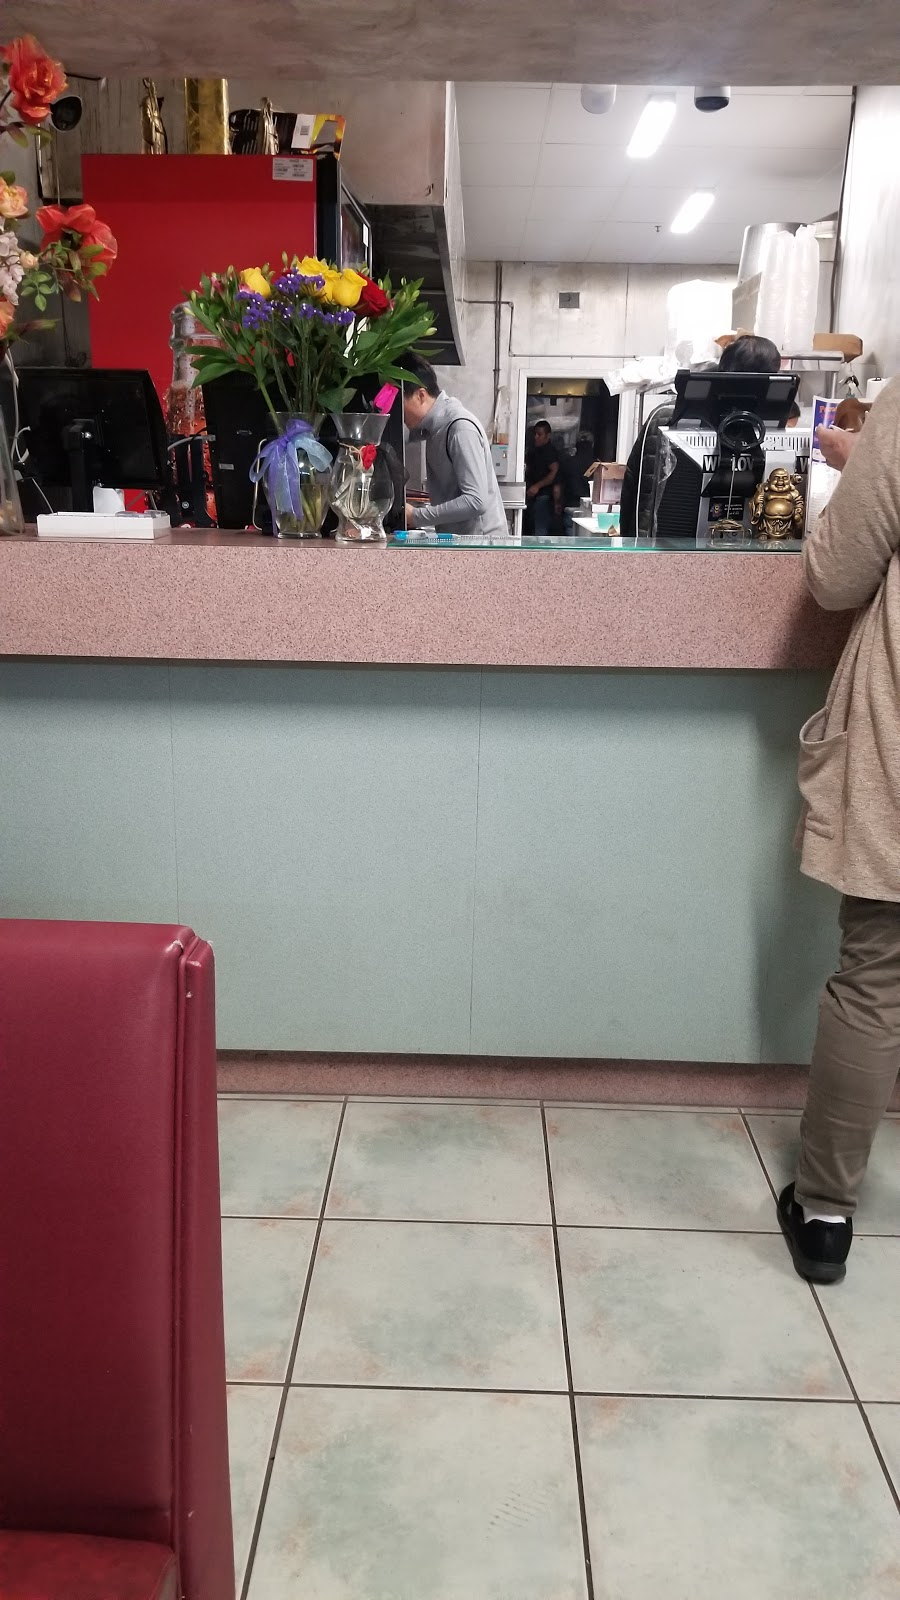 Panda Haven | restaurant | 6300 Grelot Rd, Mobile, AL 36609, USA | 2516336808 OR +1 251-633-6808